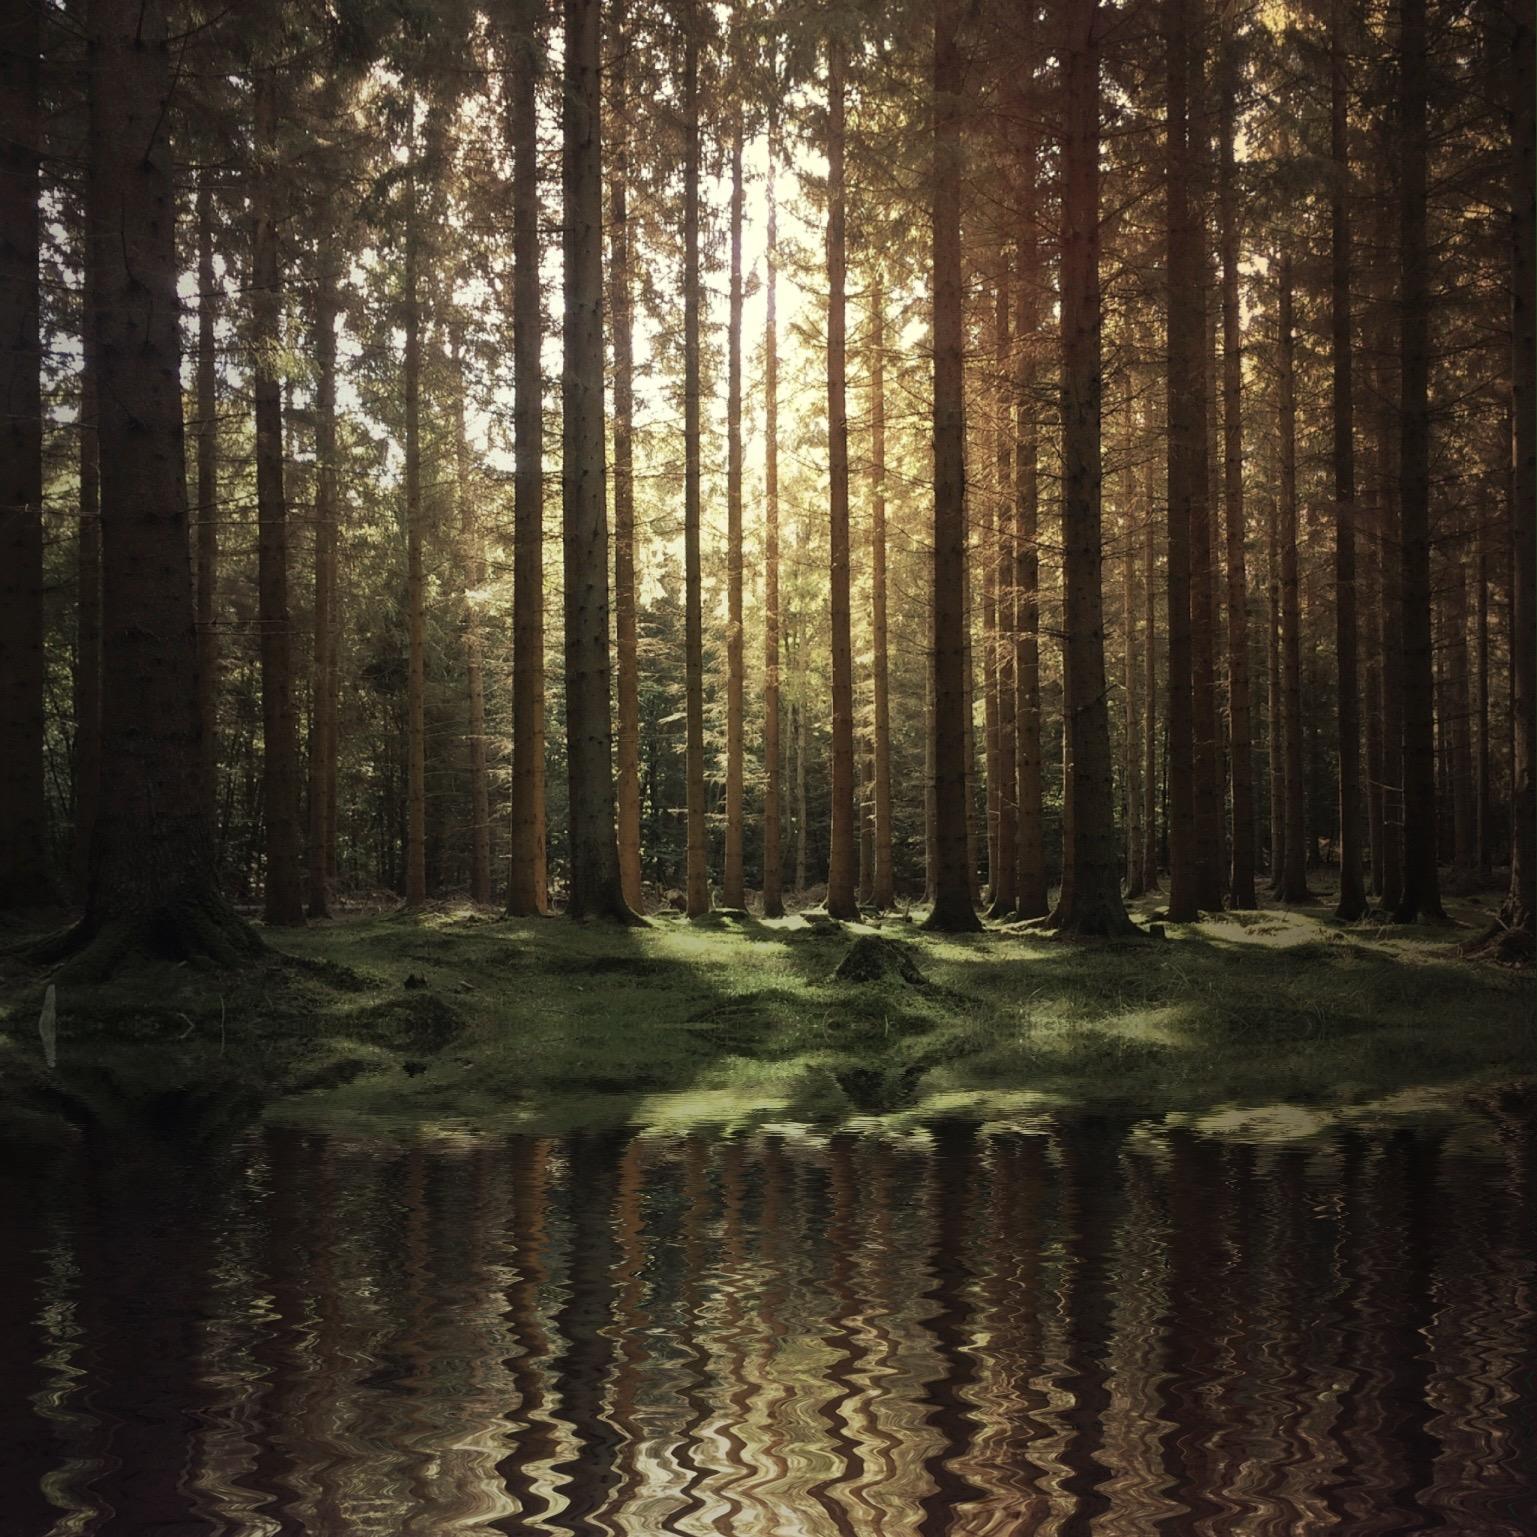 @a_have (snapseed, flood) - FPSYKVX.JPG